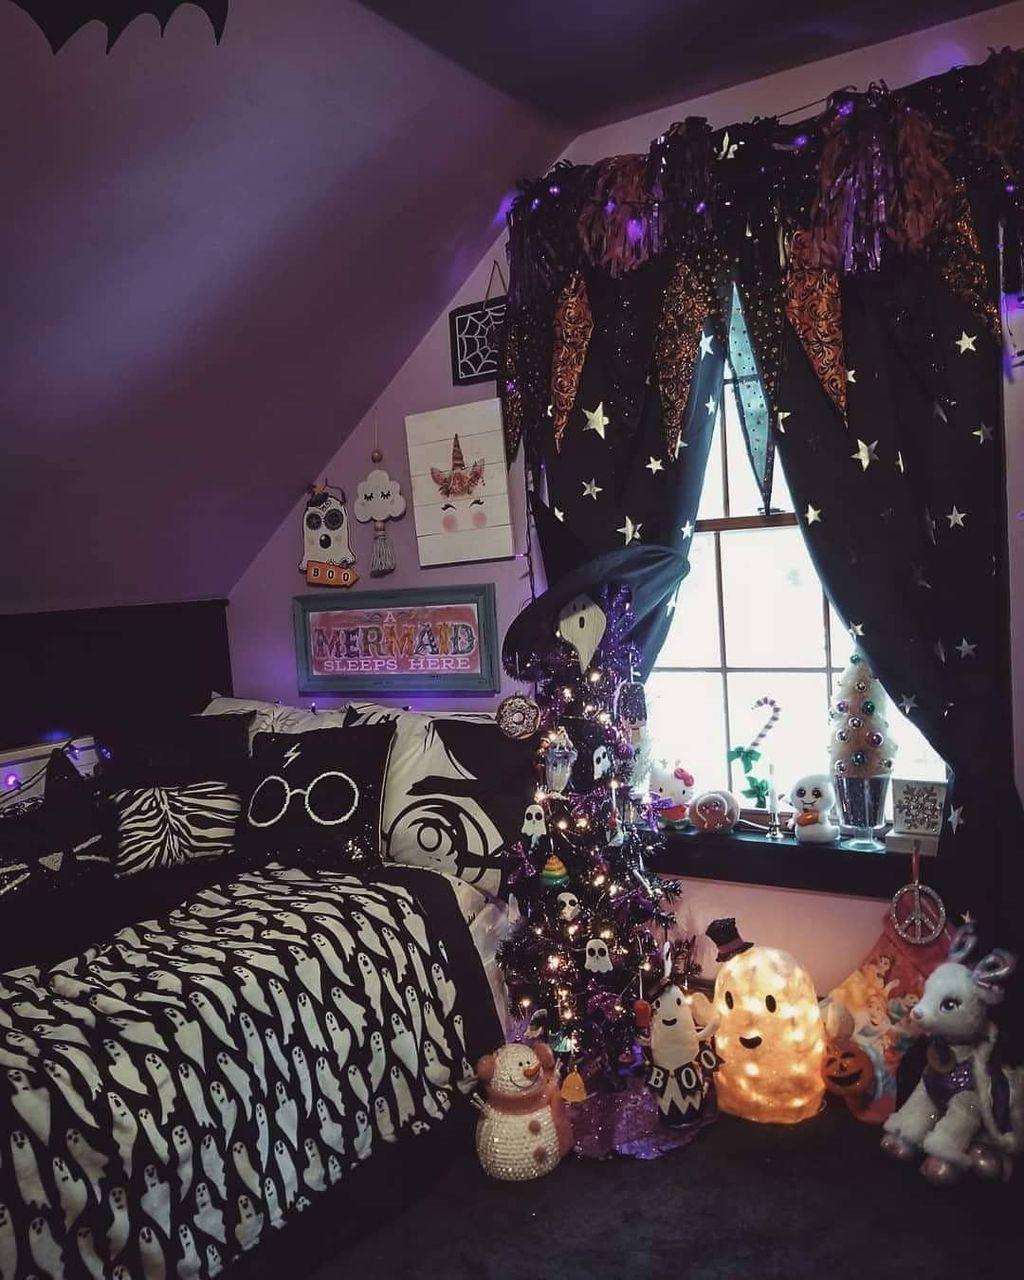 Amazing Bedroom Decoration Ideas With Halloween Theme 33